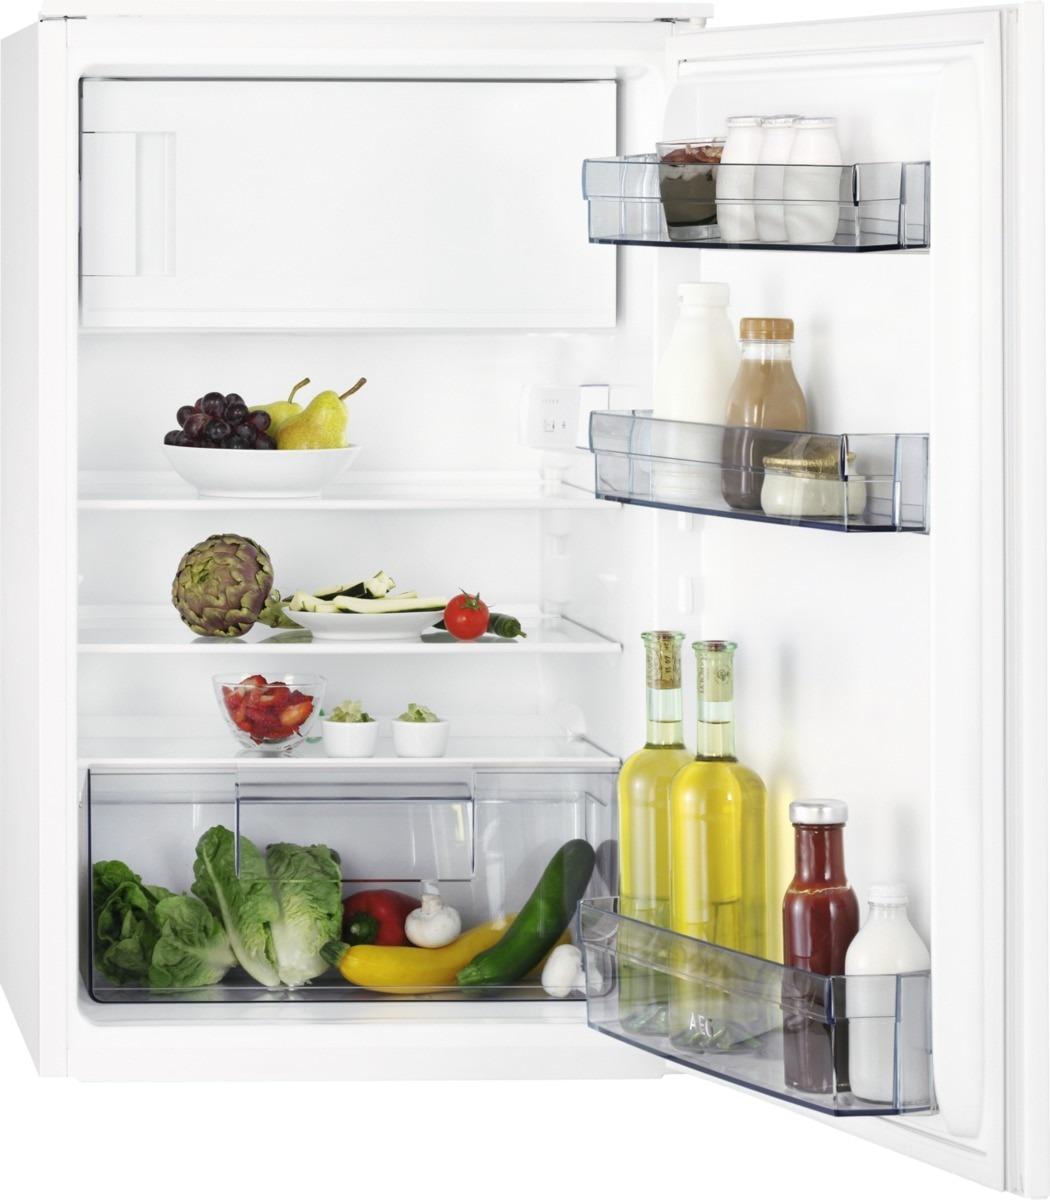 AEG SFS488F1AS Inbouw koelkast Wit